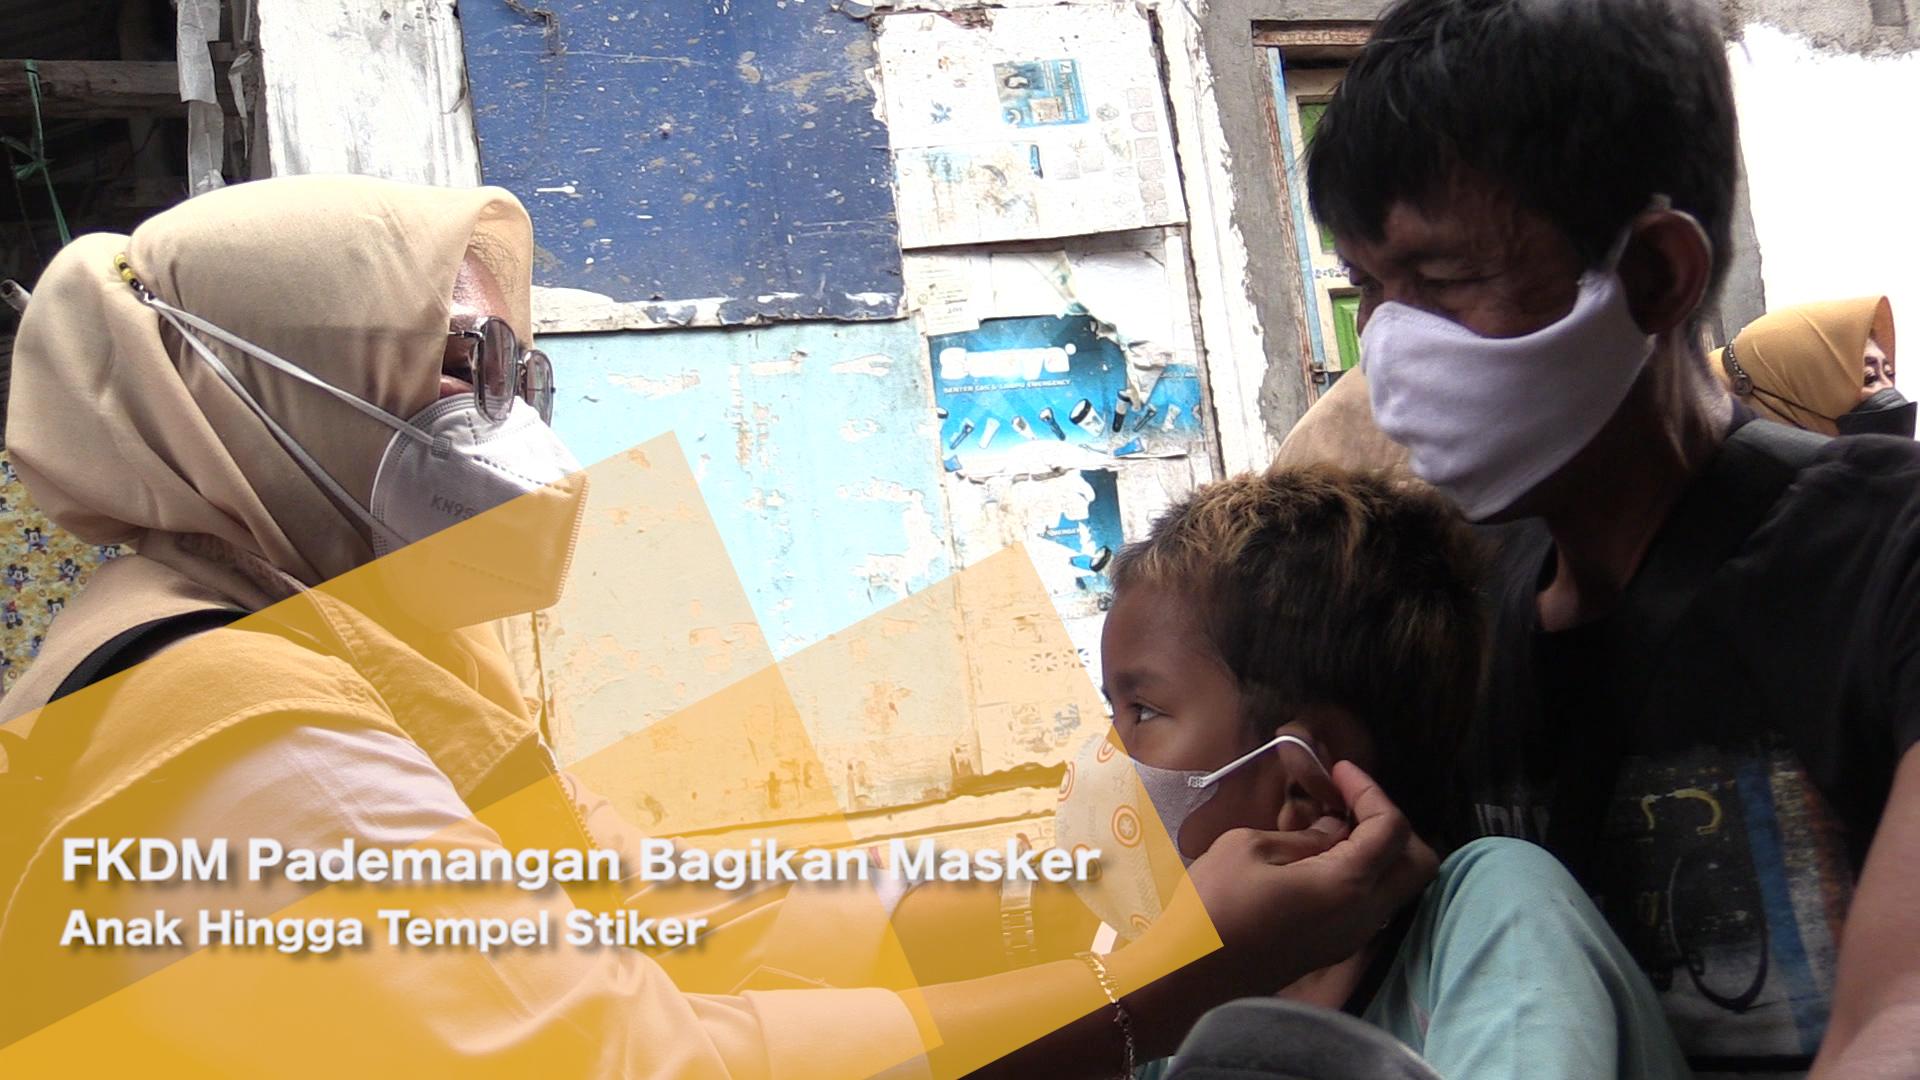 FKDM Pademangan Bagikan Masker Anak Hingga Tempel Stiker